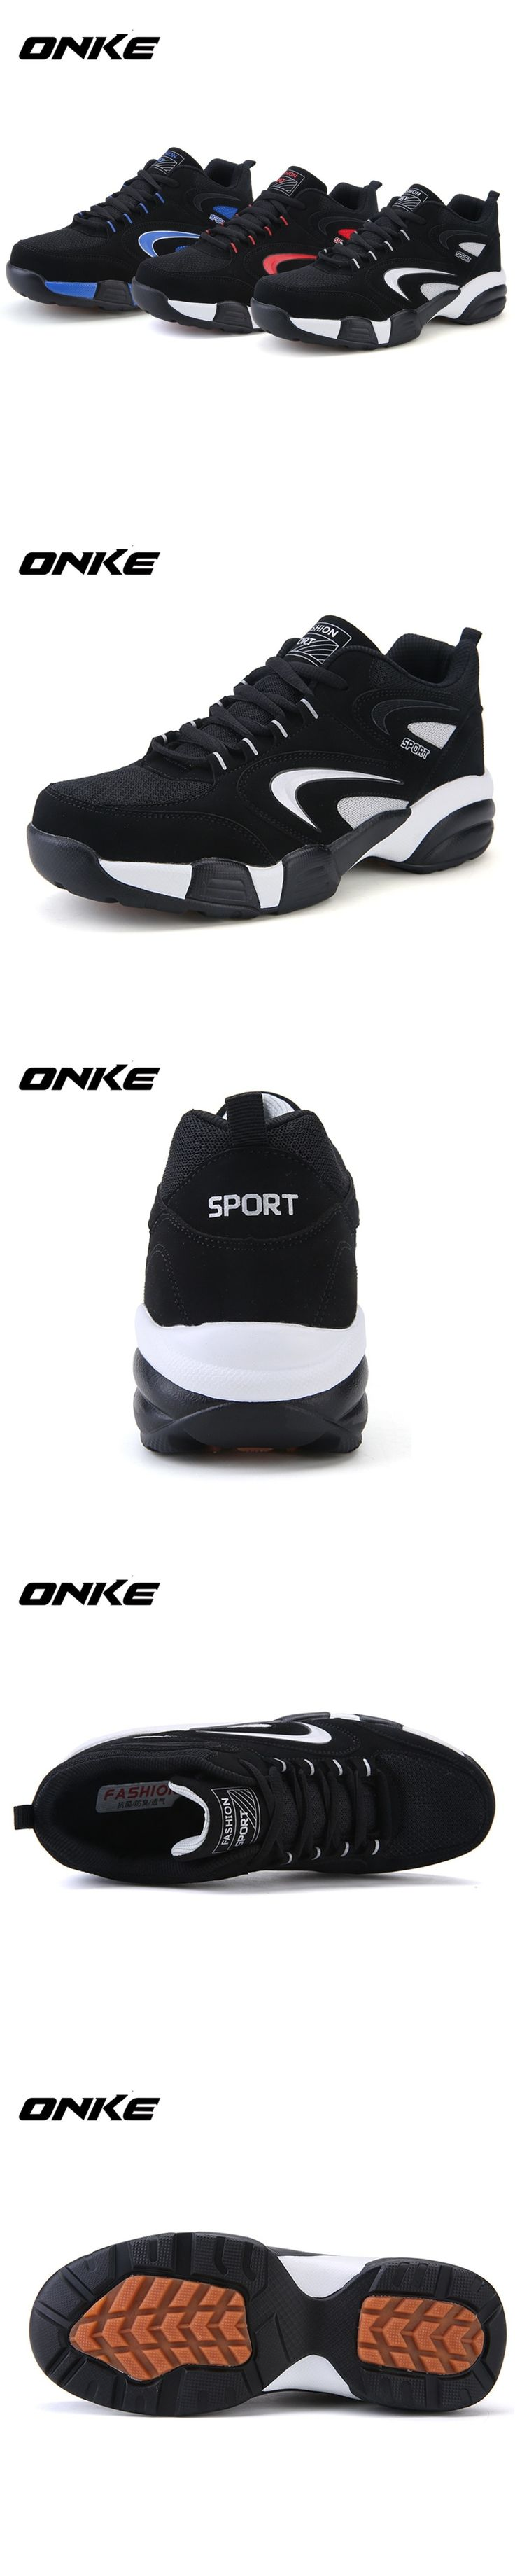 ONKE Running Shoes for Men Shoes Male Footwear Jogging Shoes zapatillas hombre scarpe uomo di marca Big Size 2017 Men Sneakers